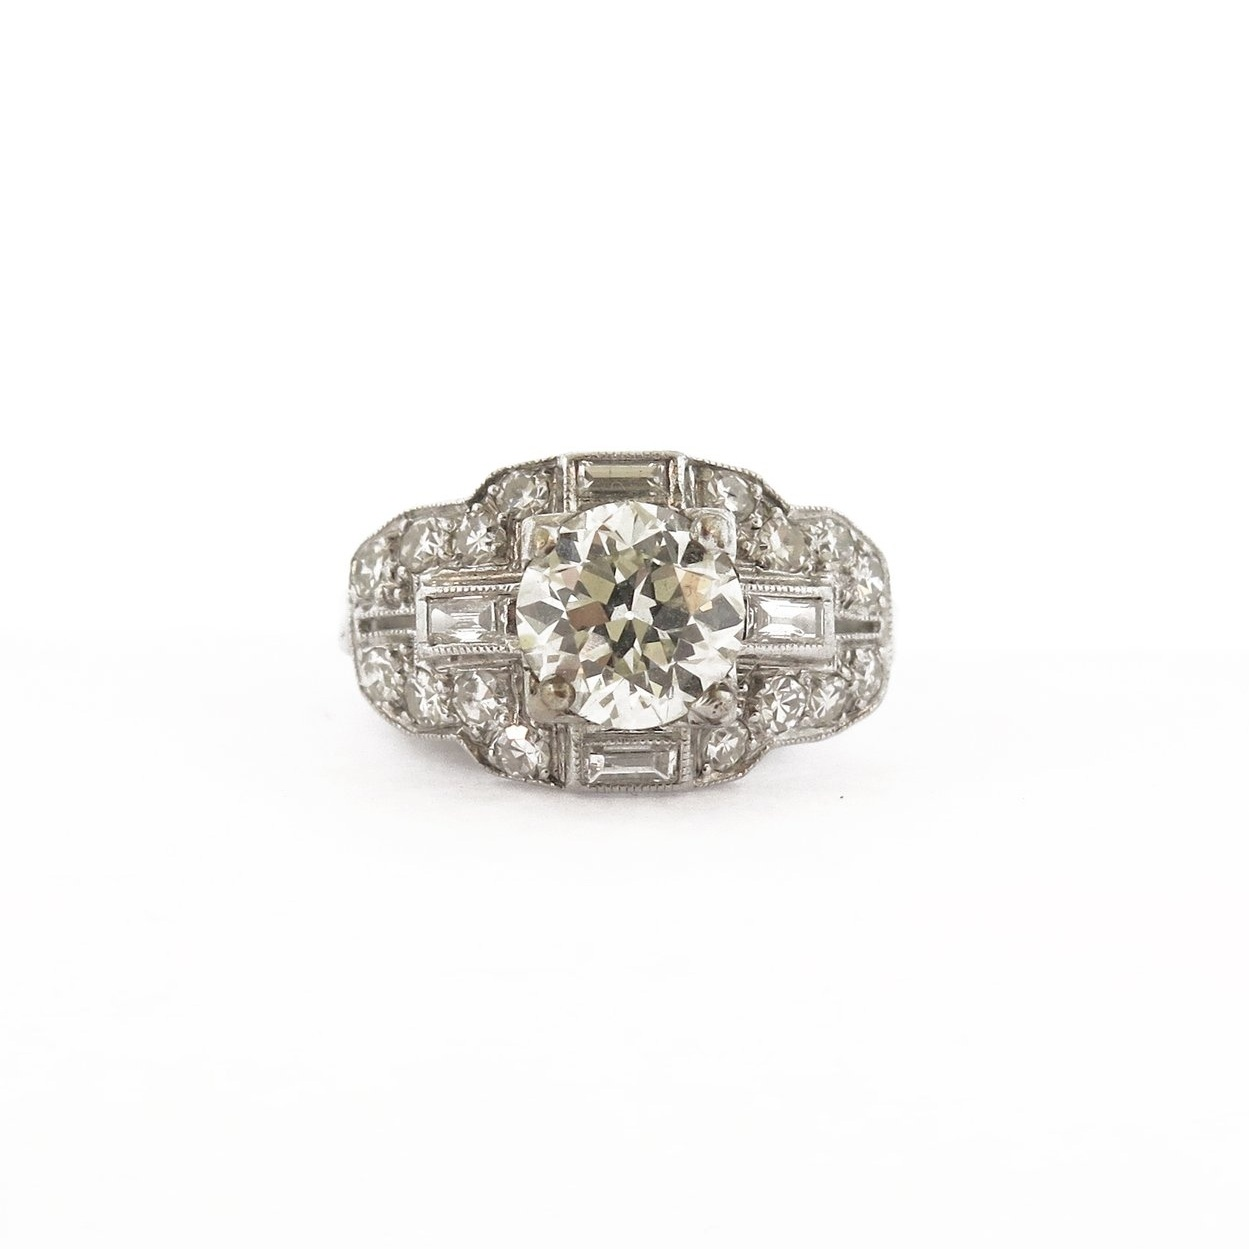 1.5 ct Diamond & Baguette Accent Ring